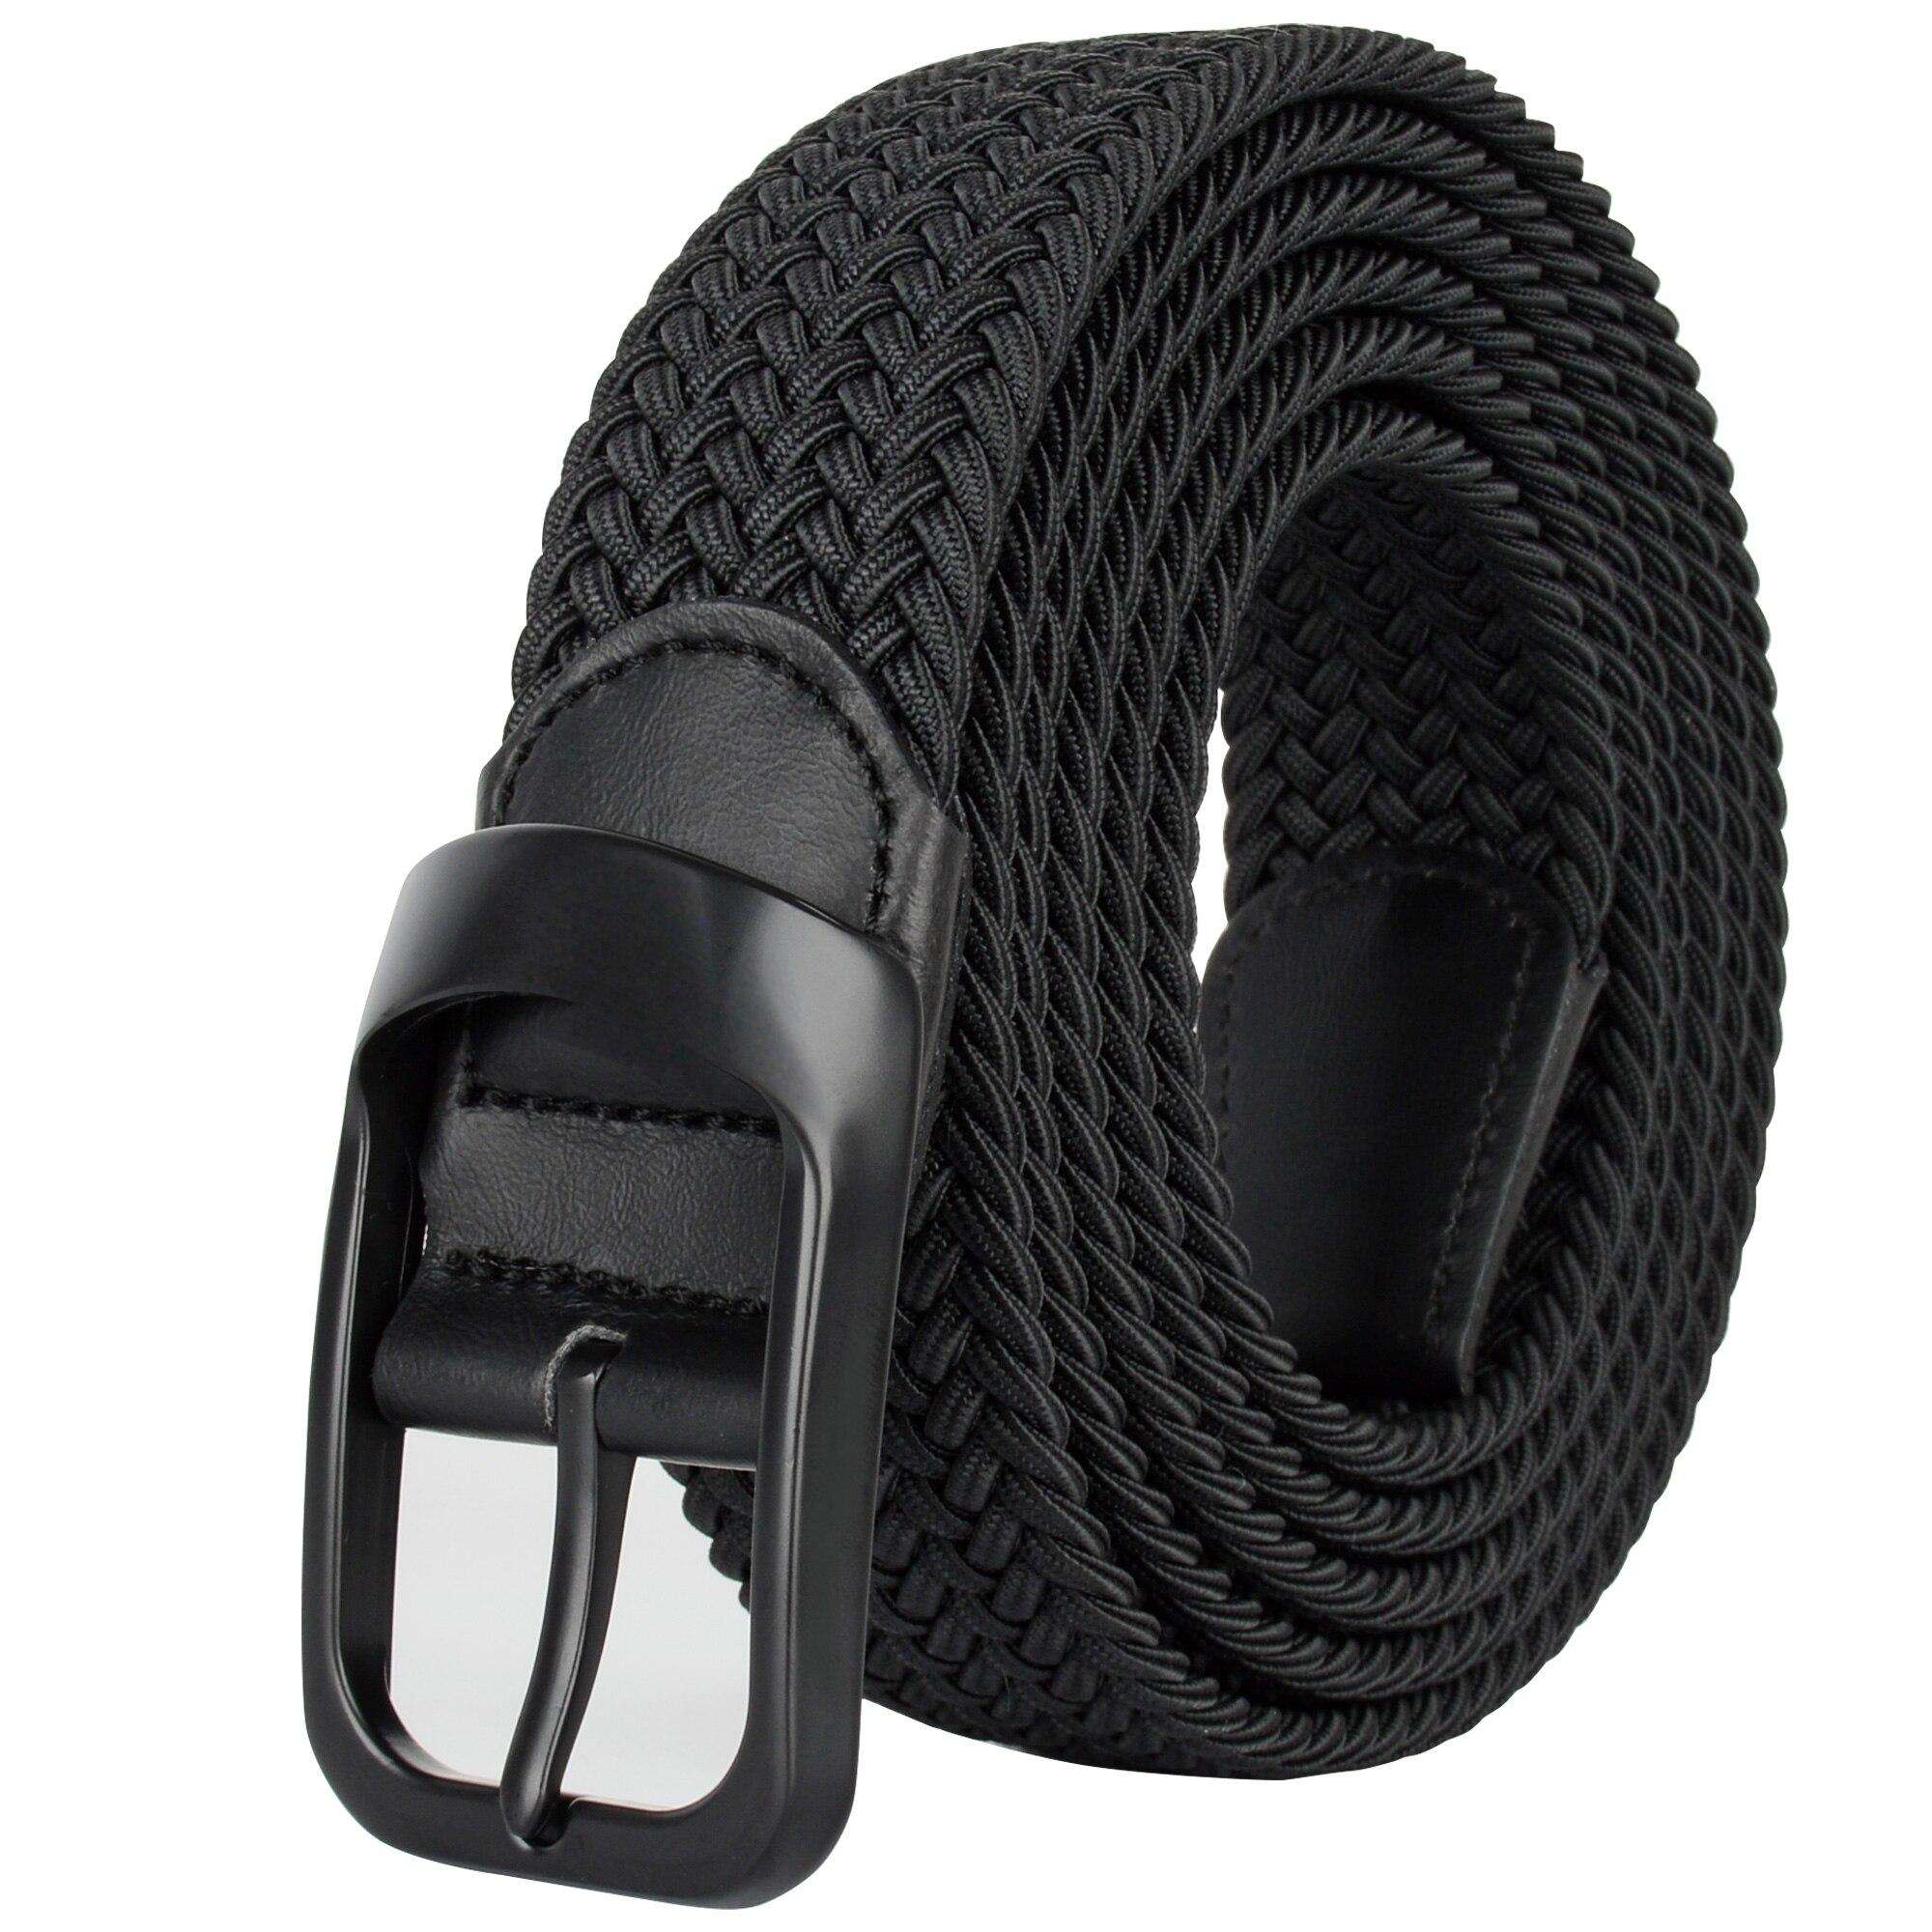 Drizzte Plus Size 100-190cm 190cm 63'' 67'' 71'' Long Black Braid Elastic Stretch Belt Mens Metal Buckle for Big and Tall Man